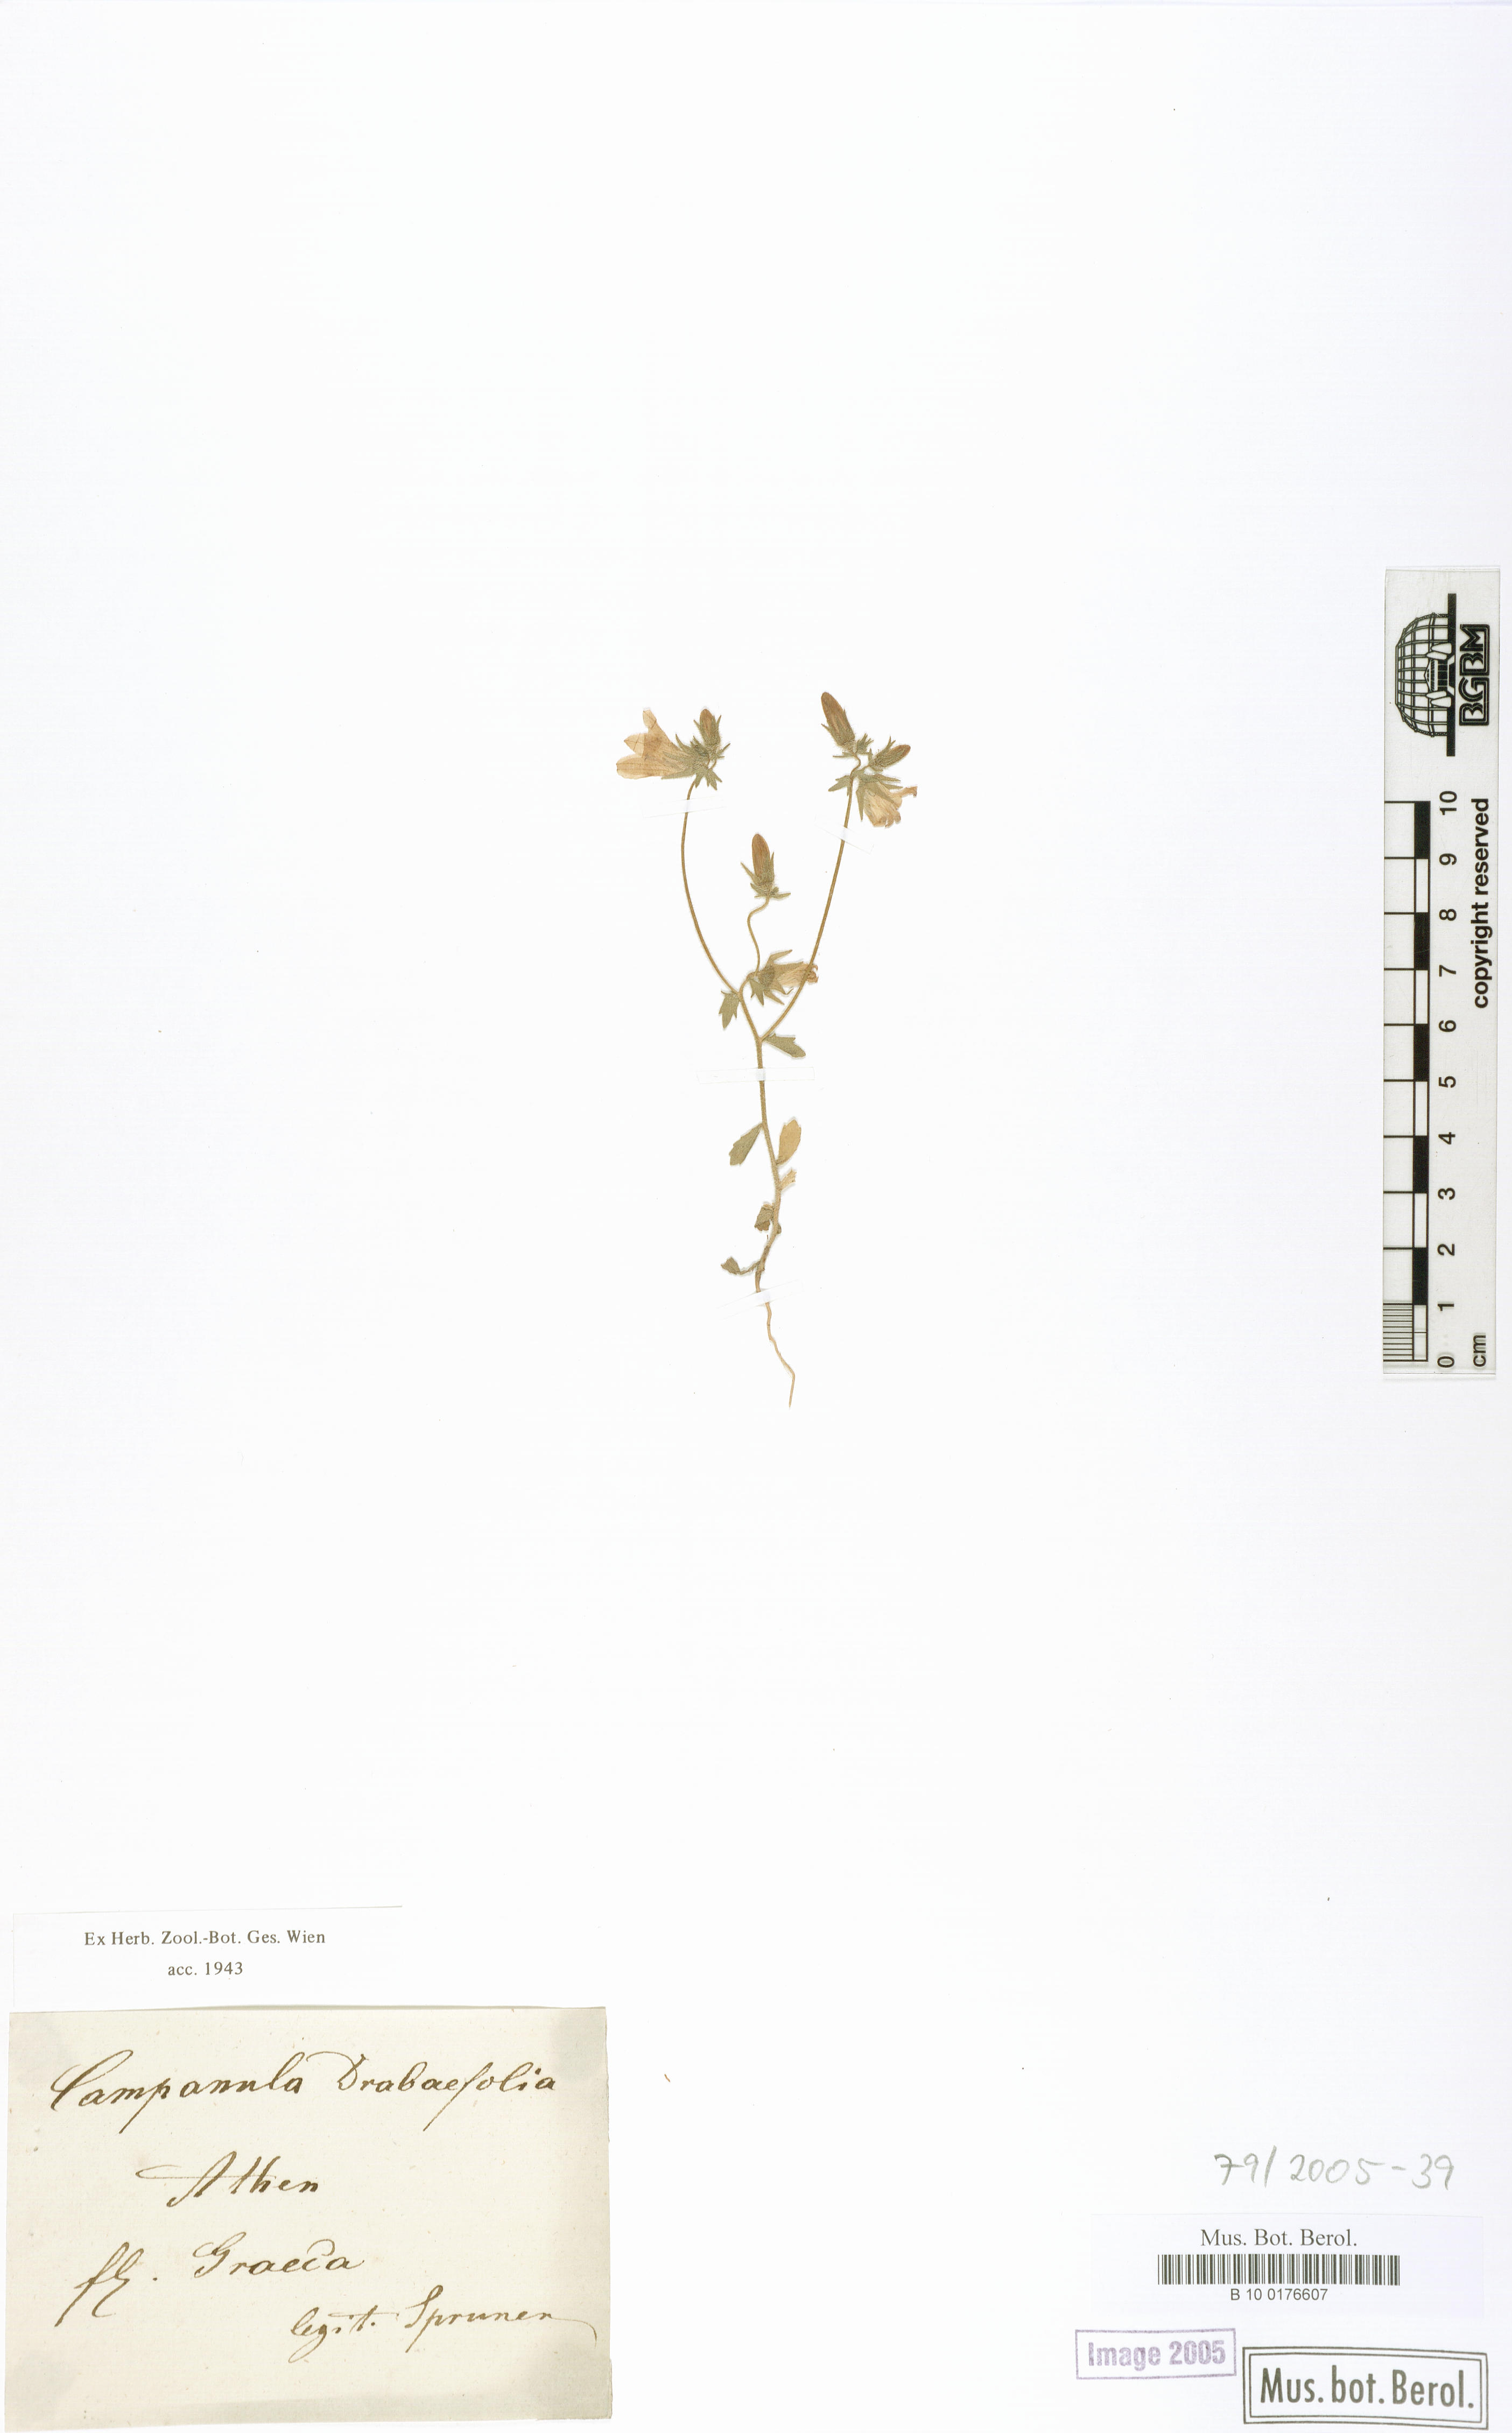 http://ww2.bgbm.org/herbarium/images/B/10/01/76/60/B_10_0176607.jpg